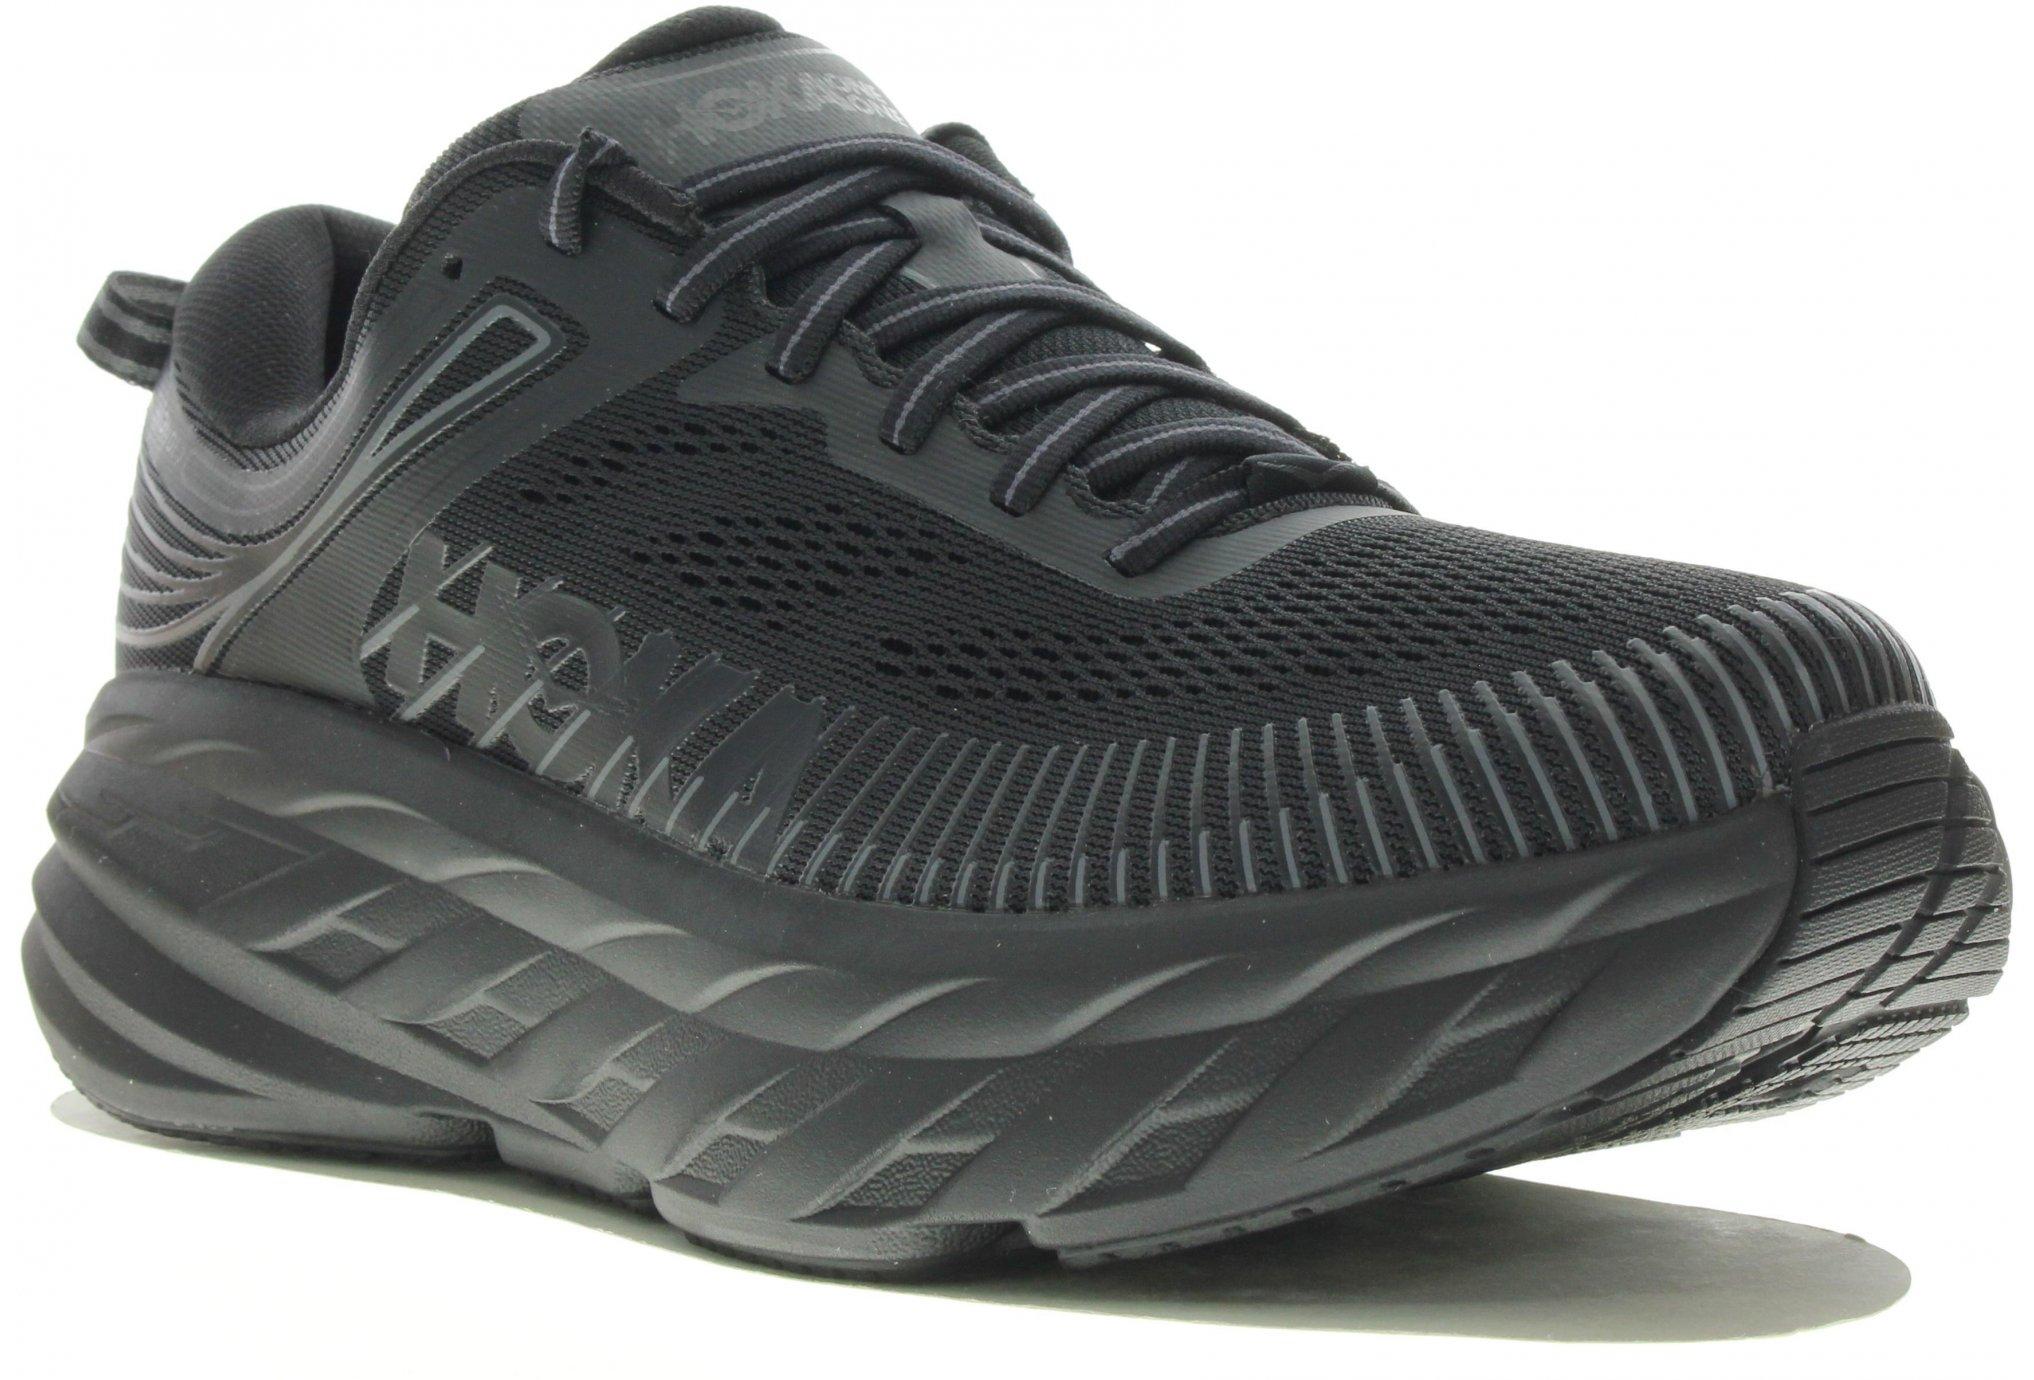 Hoka One One Bondi 7 Wide W Chaussures running femme